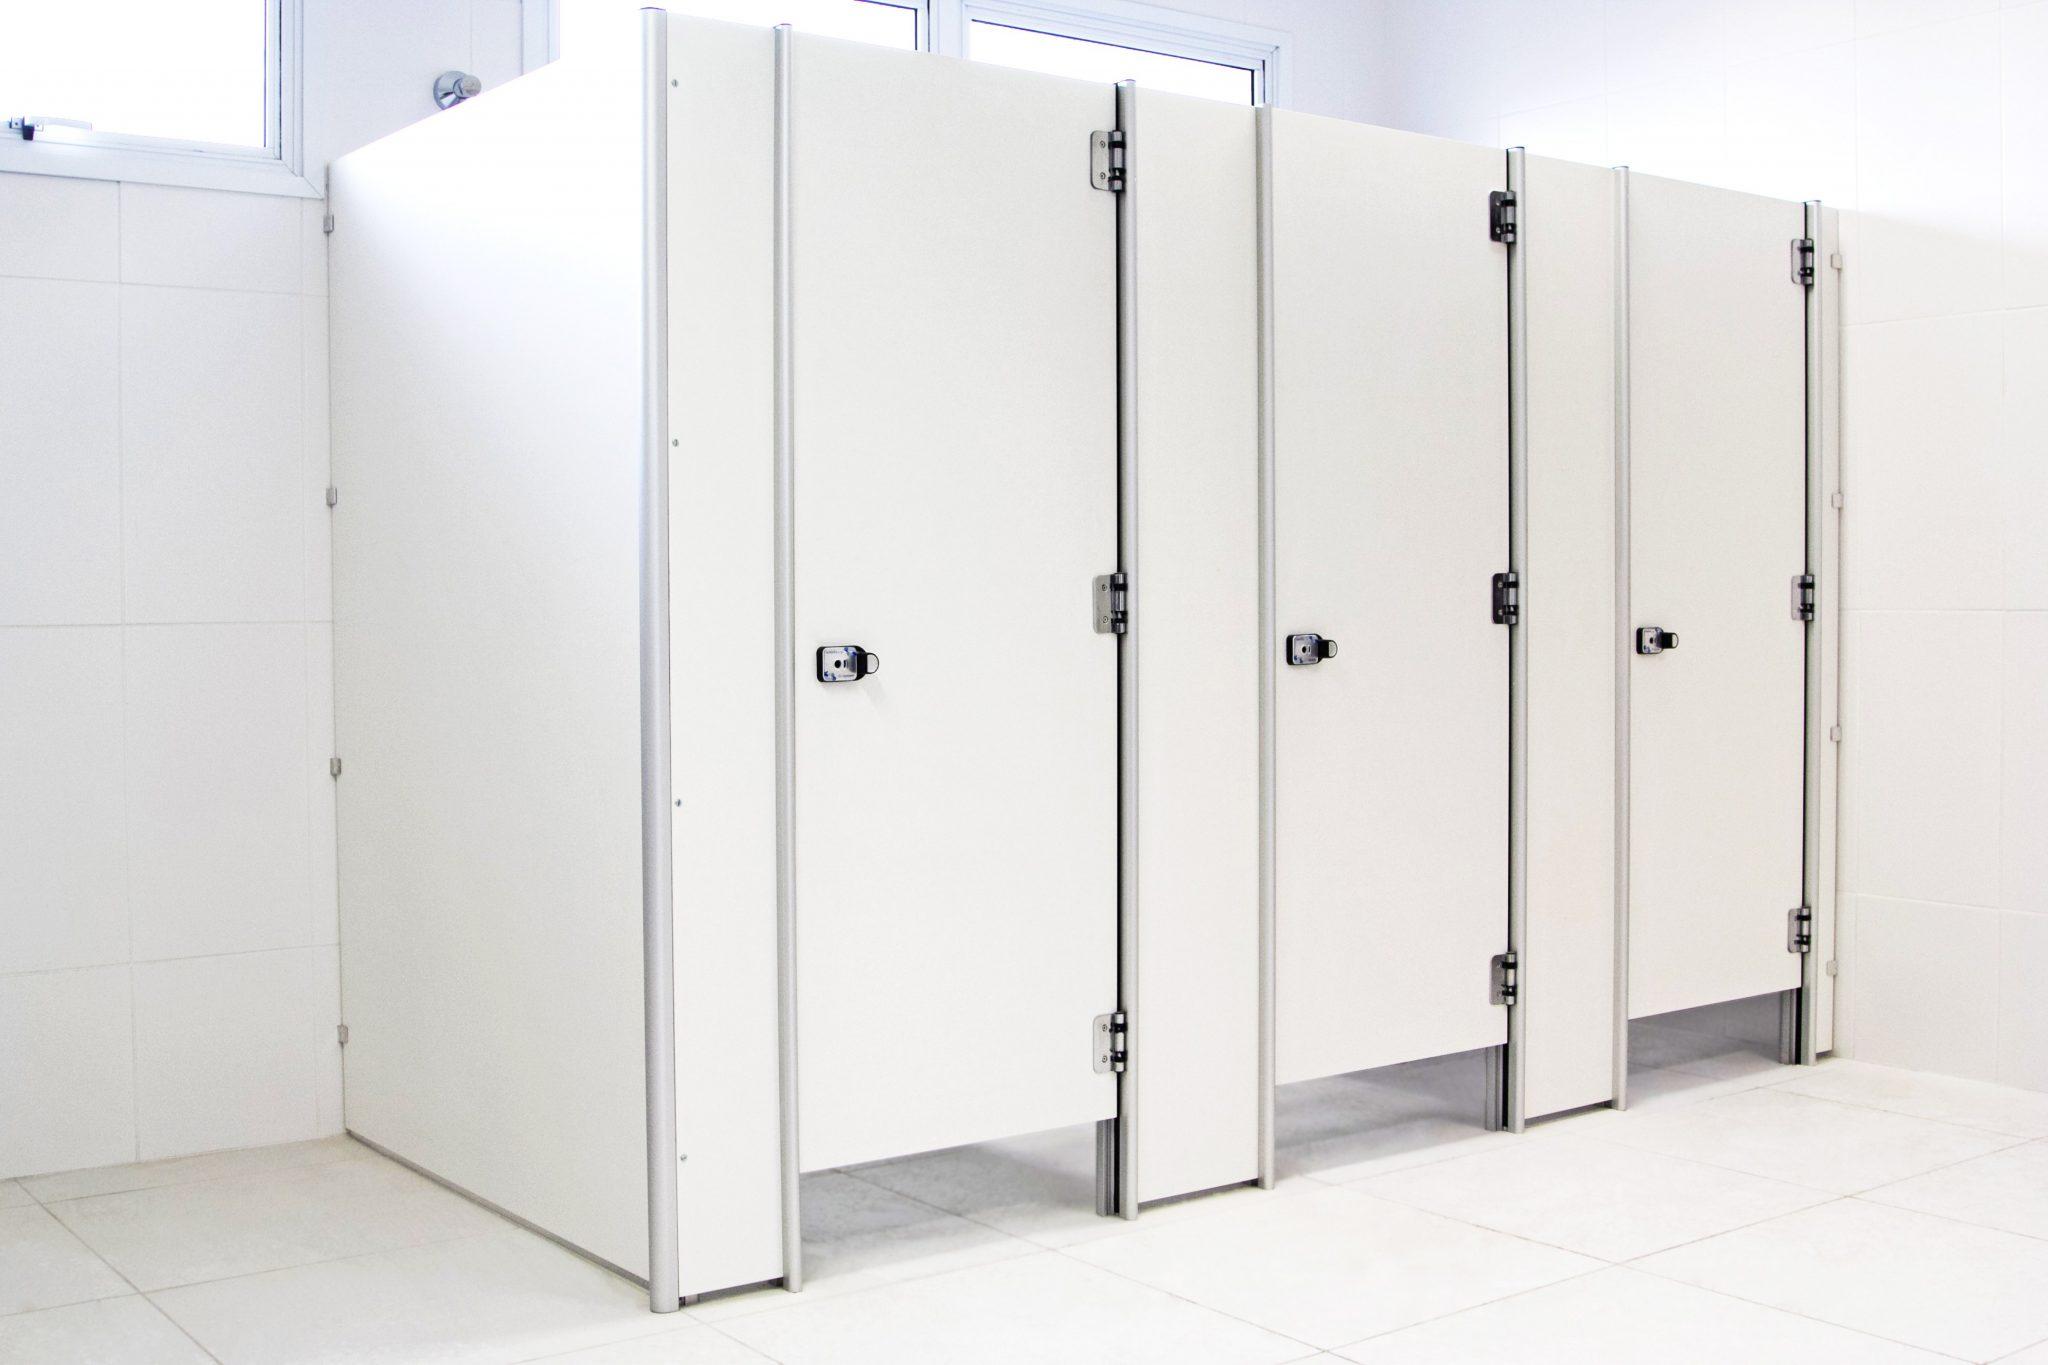 divisoria-sanitaria-banheiro-ts-branco-neve.jpg